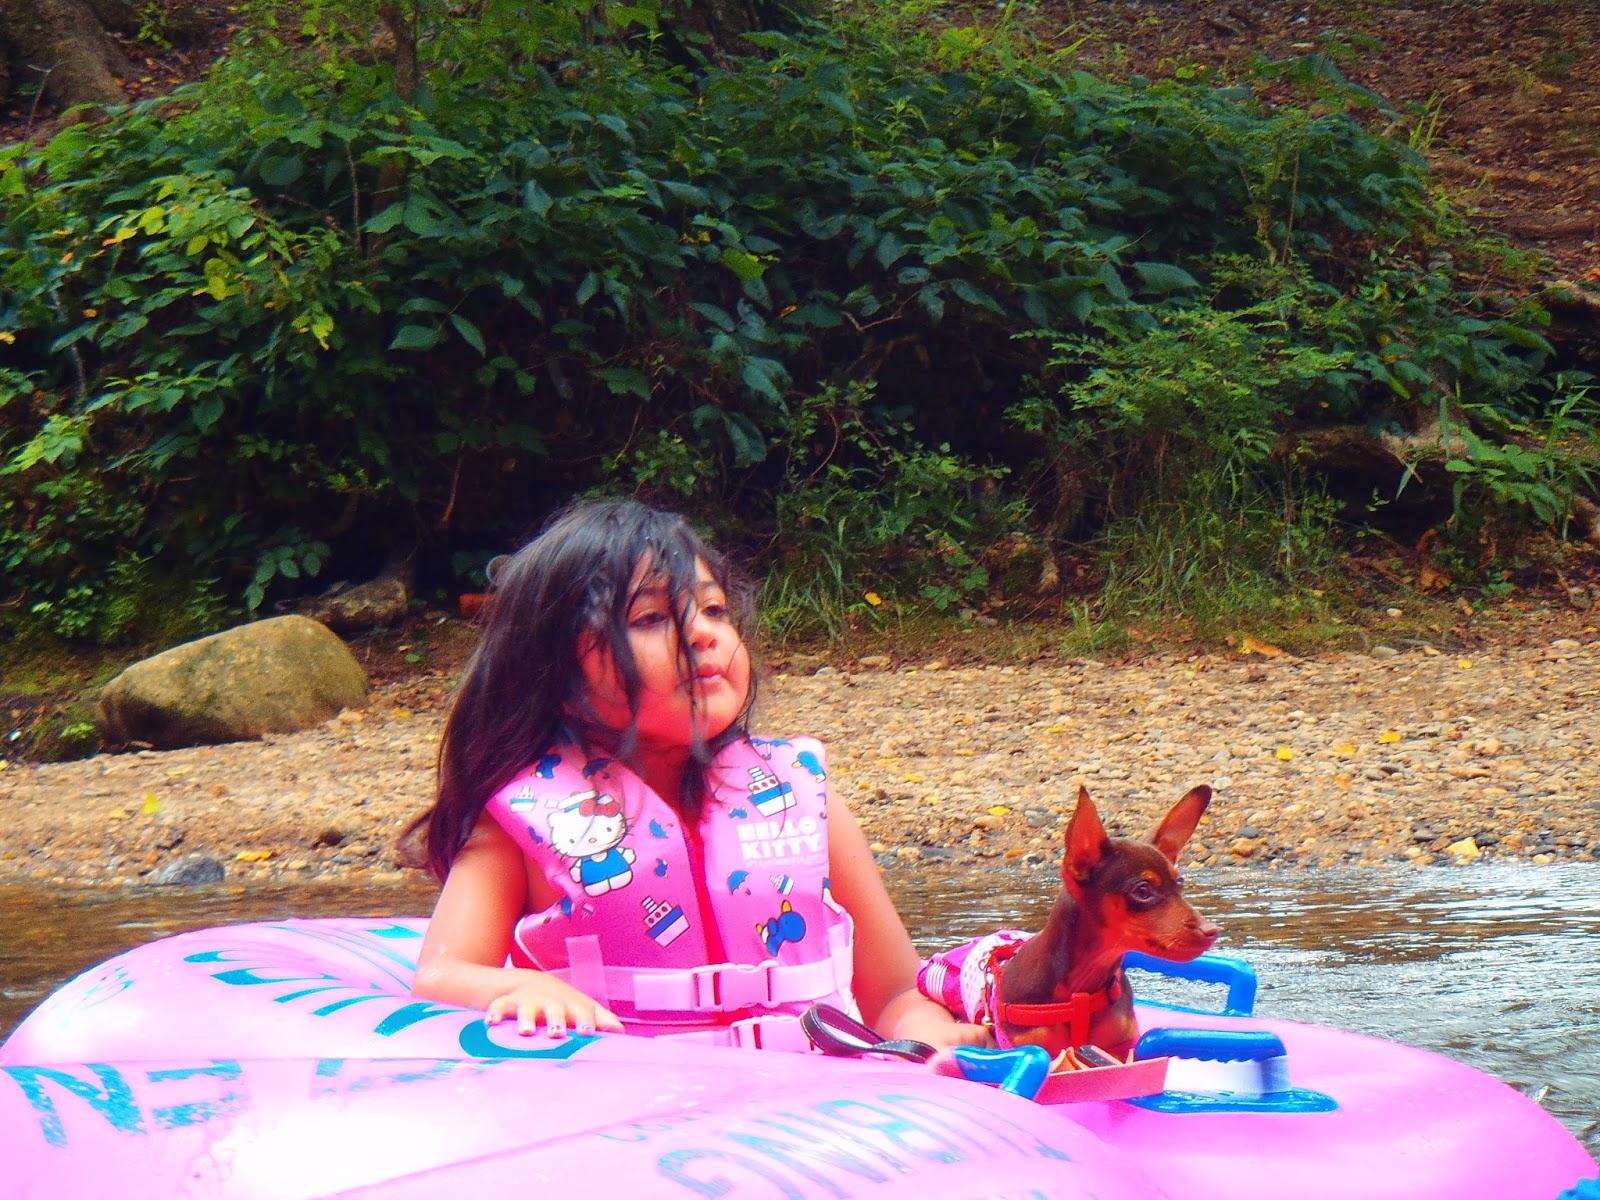 Girl tubing with dog in Helen Georgia